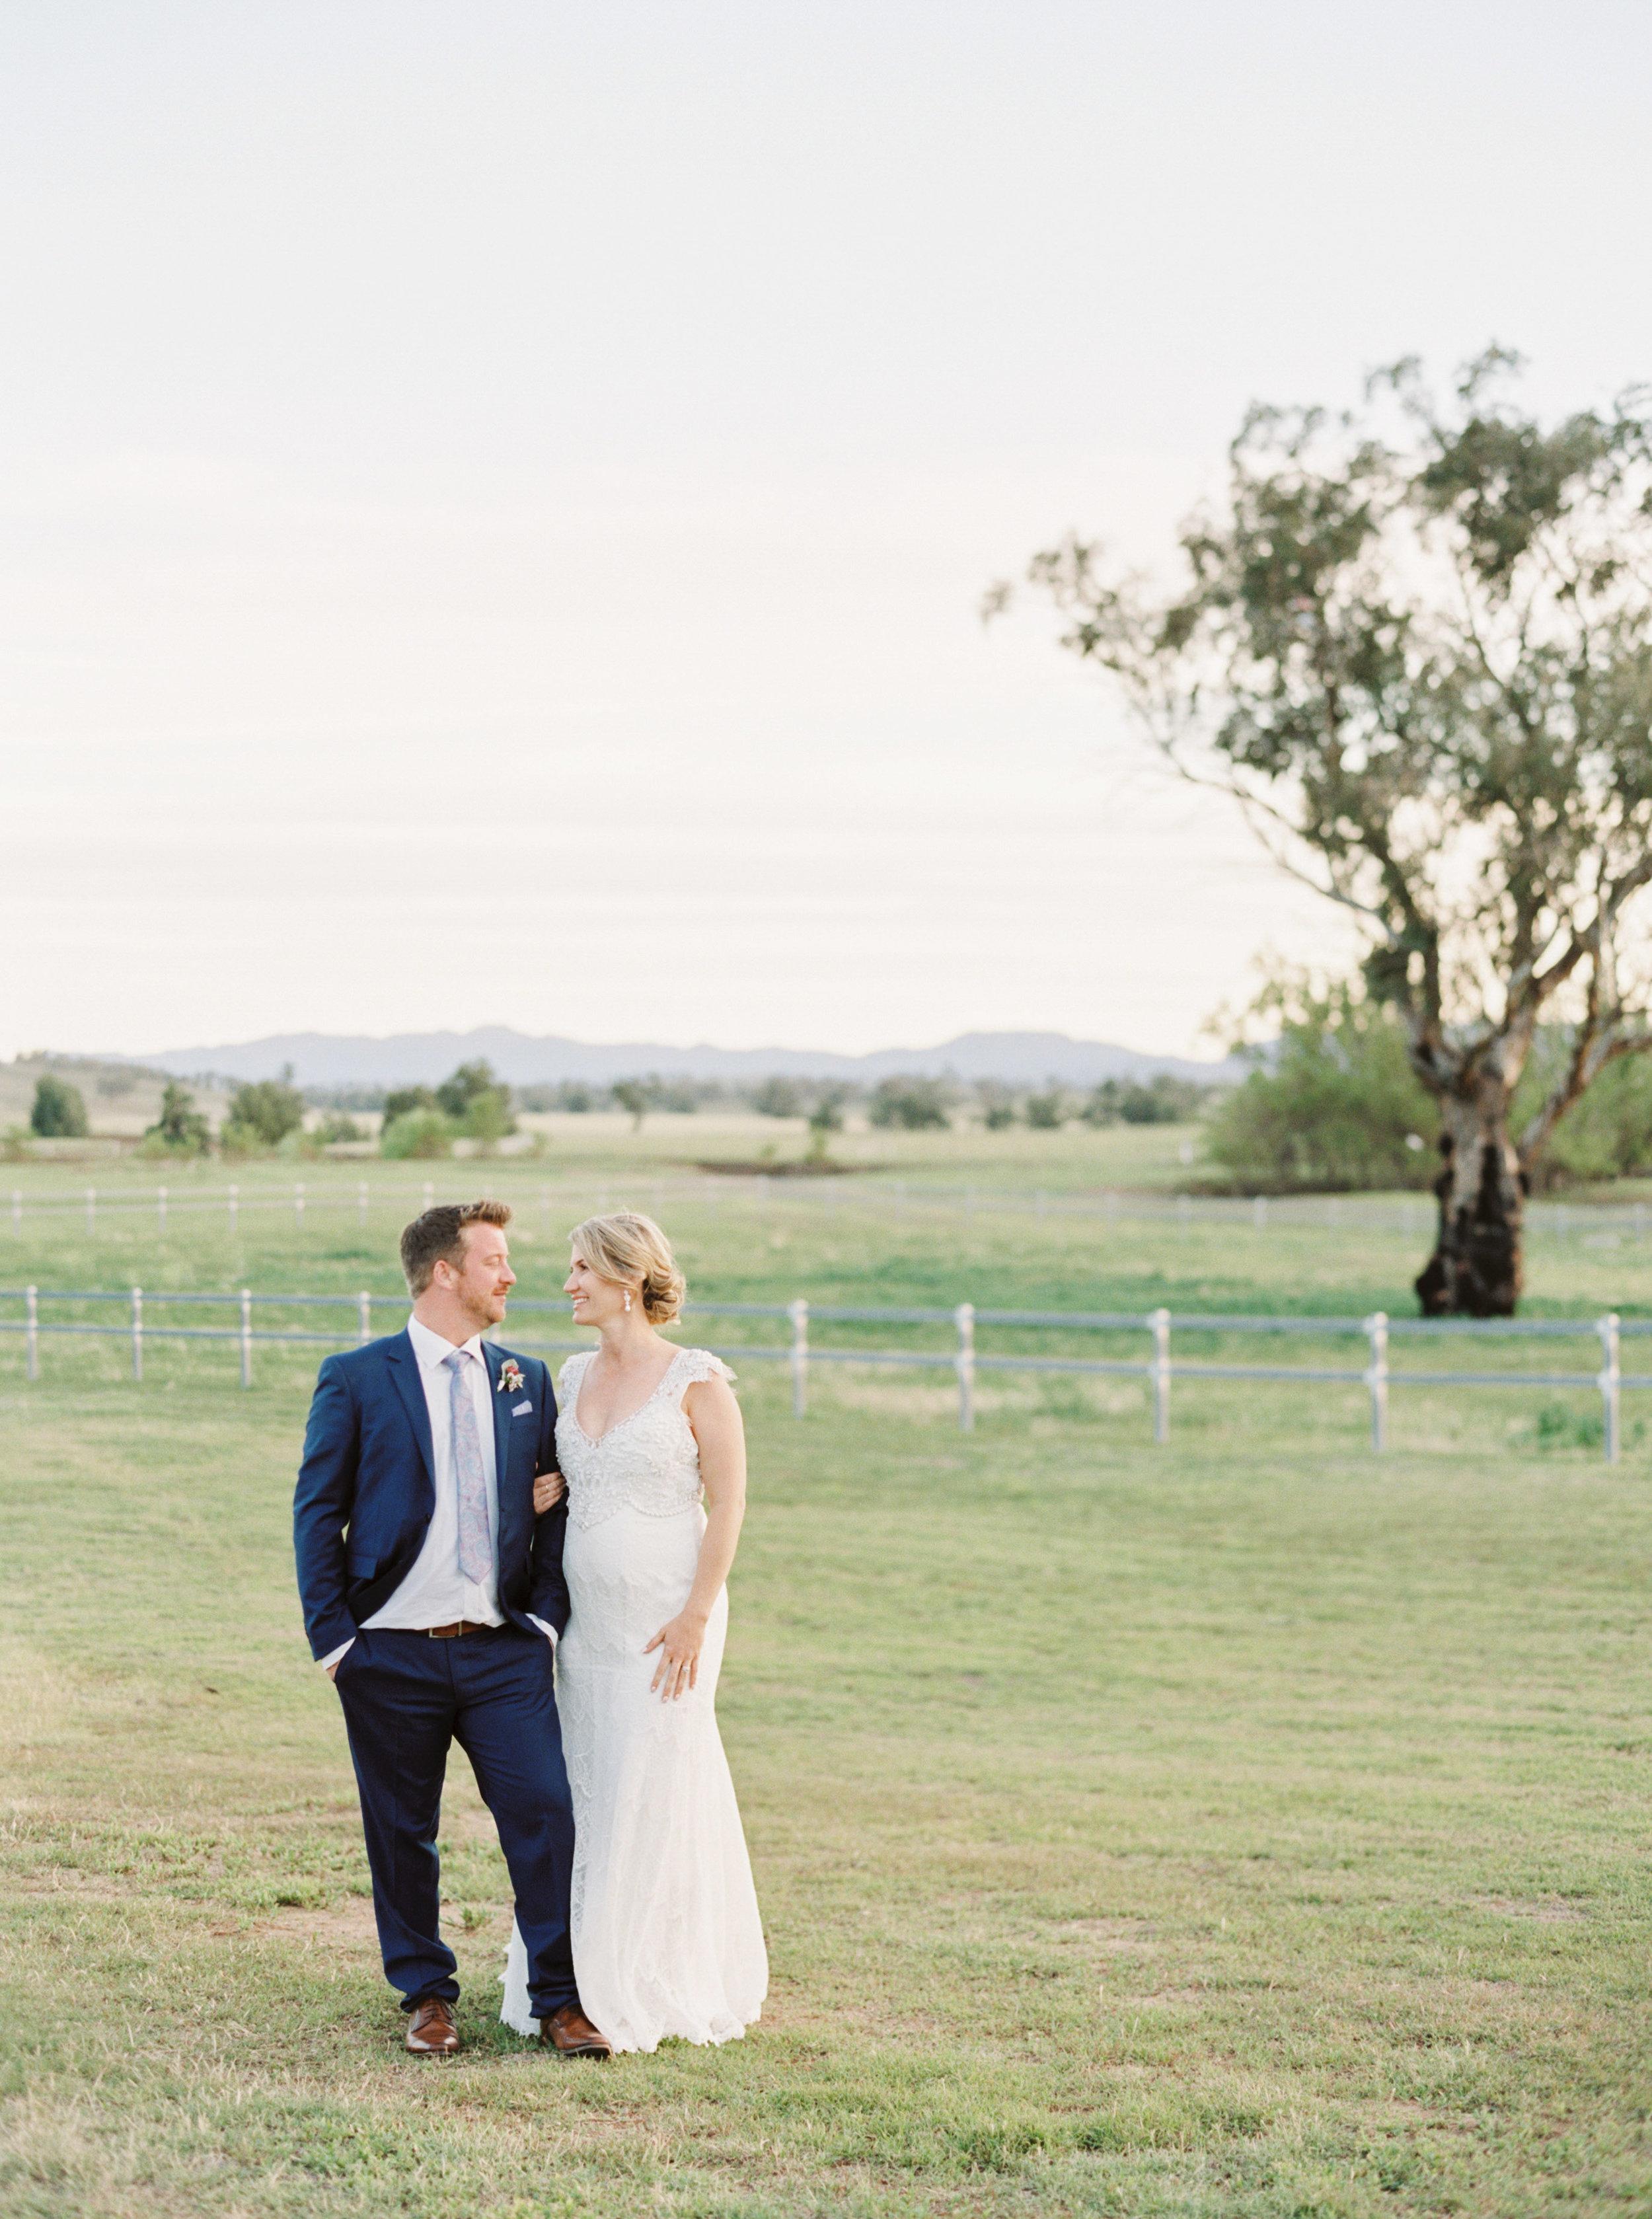 00101- Goonoo Goonoo Station Wedding Tamworth NSW Fine Art Film Wedding Photographer Sheri McMahon_-2.jpg